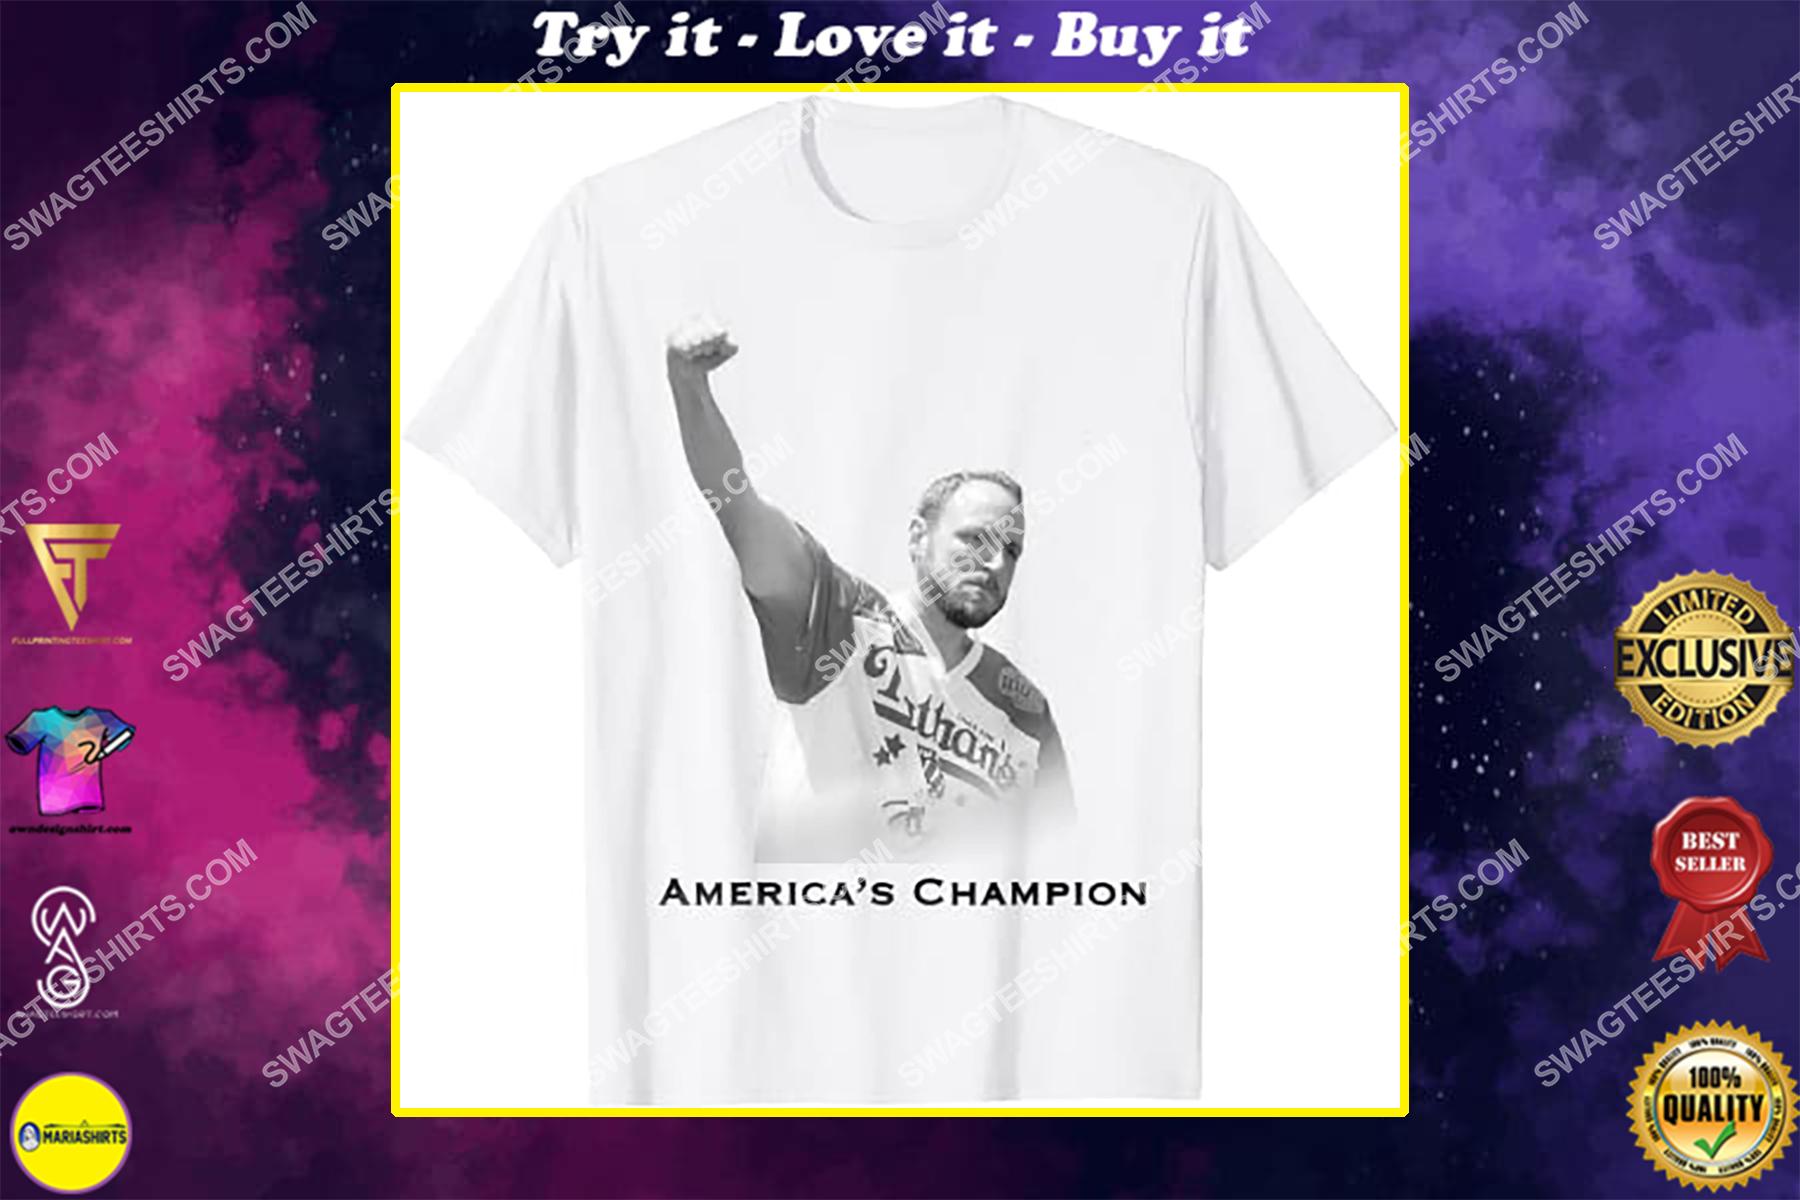 vintage joey chestnut america's champion shirt